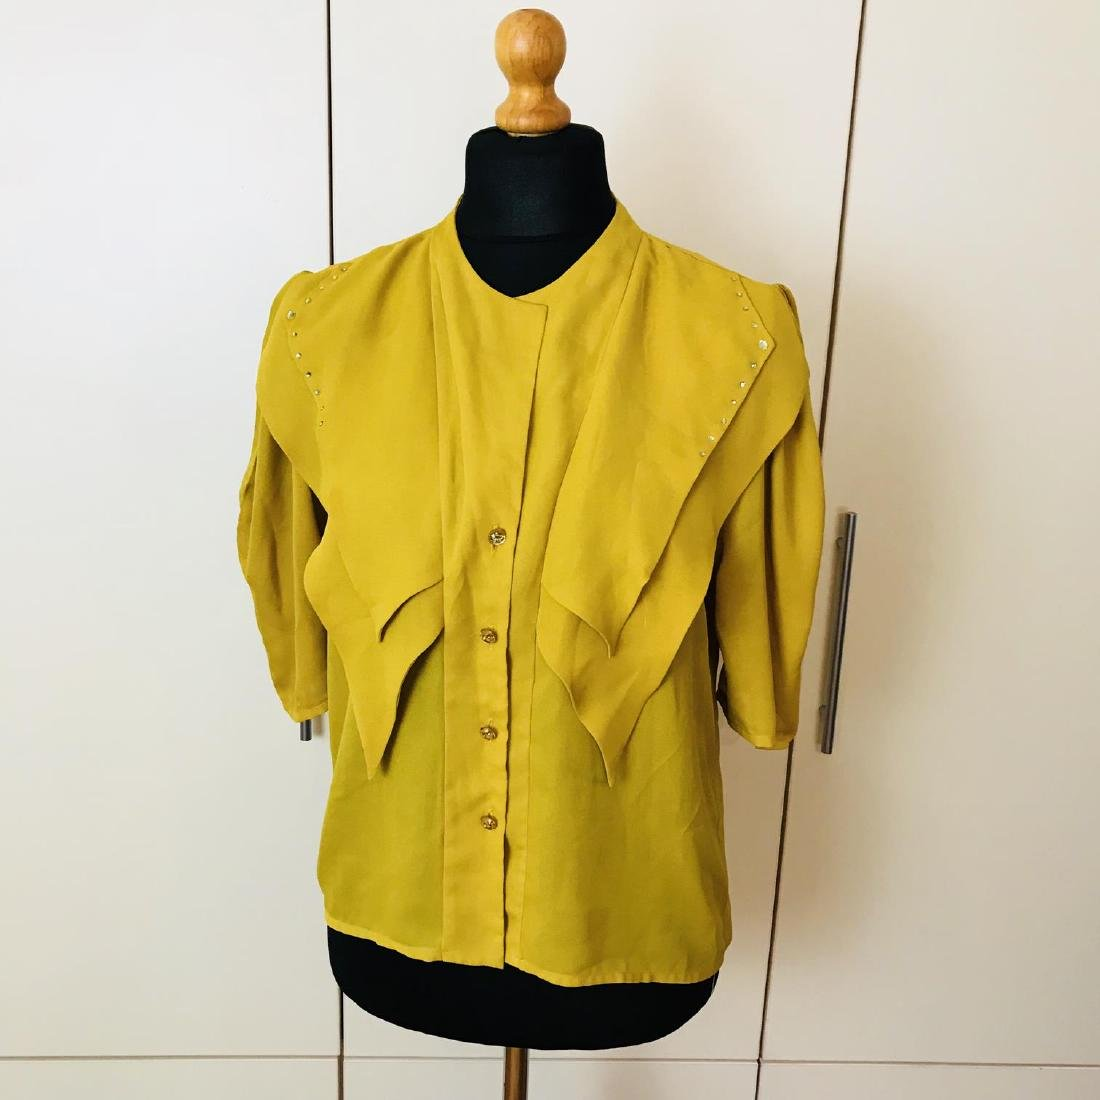 Vintage Women's Yellow Blouse Shirt Top Size EUR 40 US